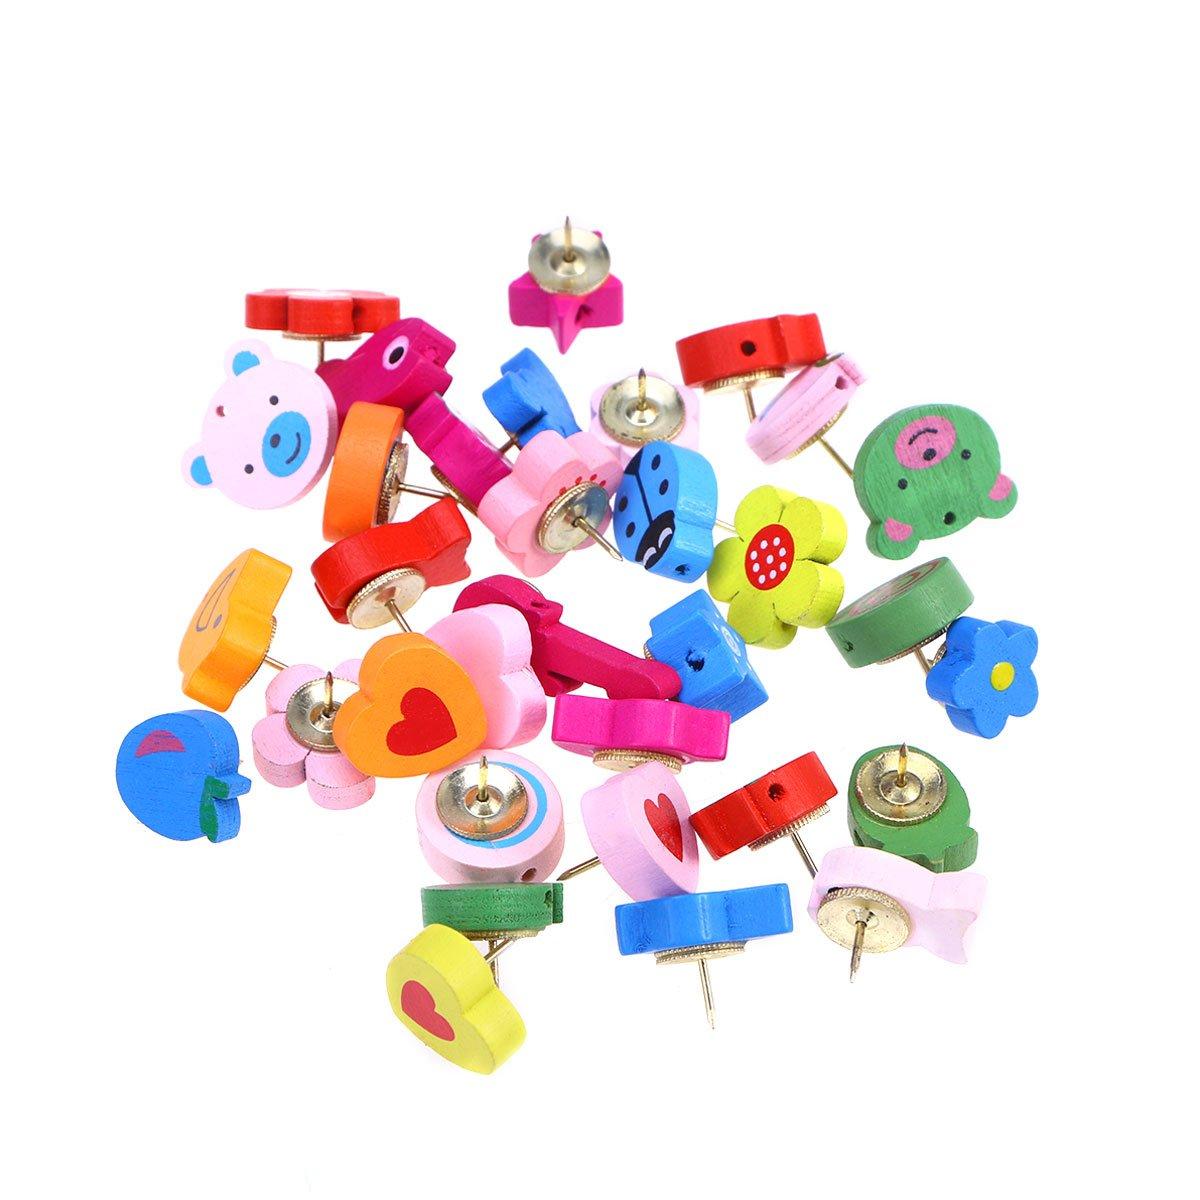 stobok 30/PCS Puntine Decorative Cartoon animale Puntine in legno per lavagna Parete lavagna colore assortimento